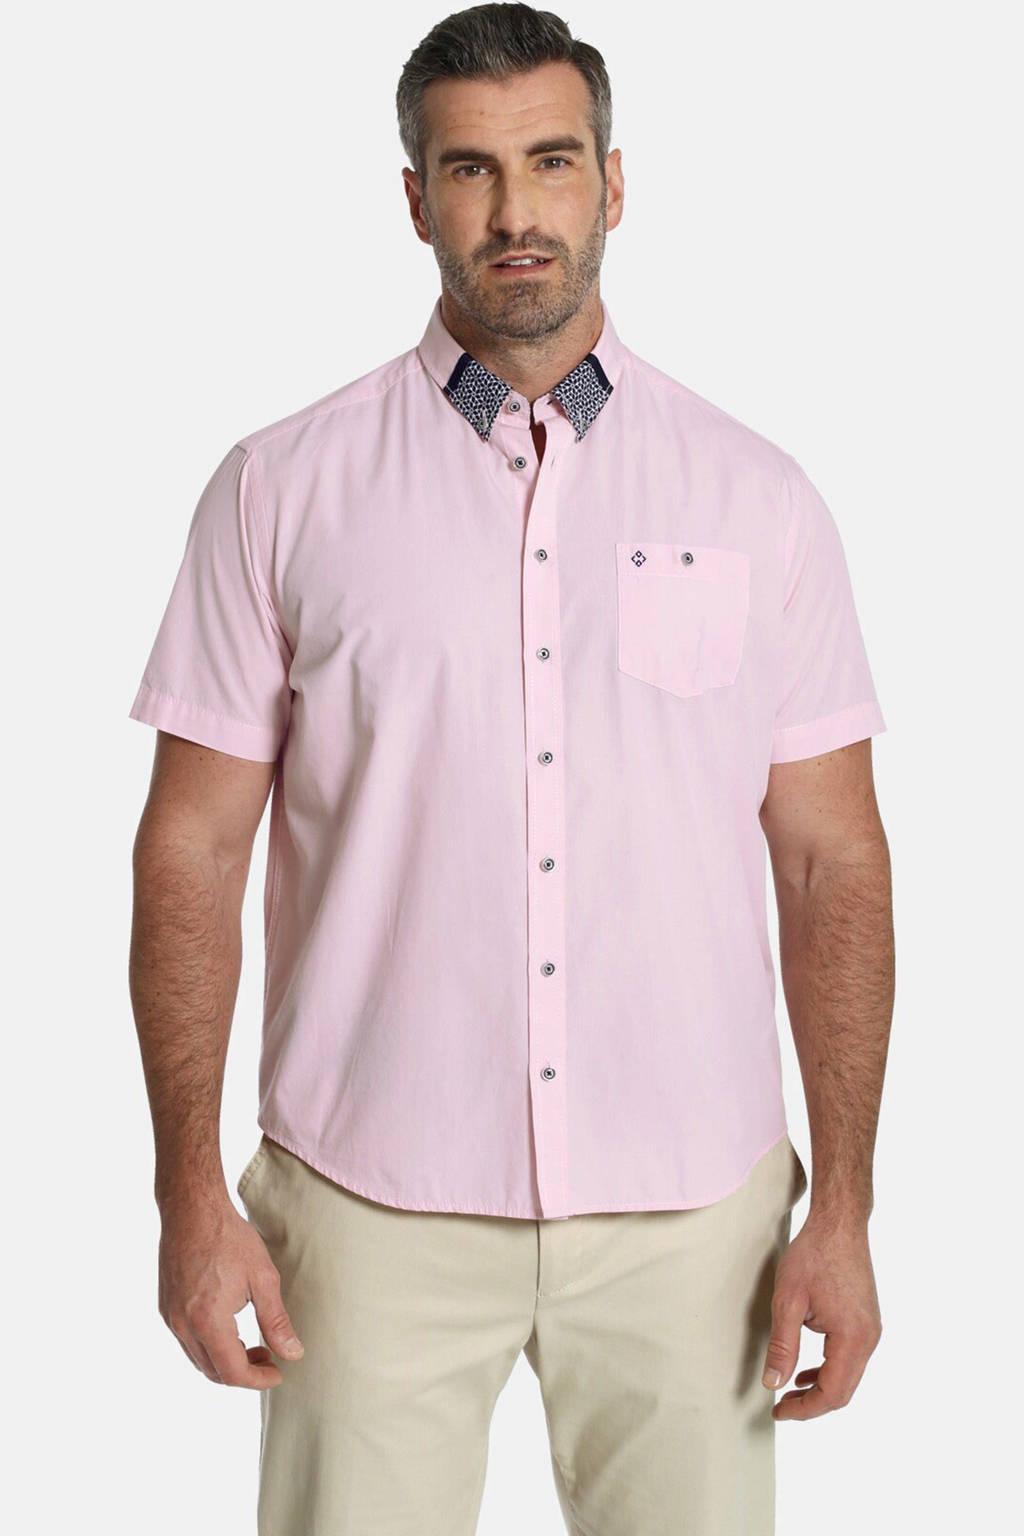 Charles Colby oversized overhemd DUKE GRAYSON Plus Size roodroze, Roodroze